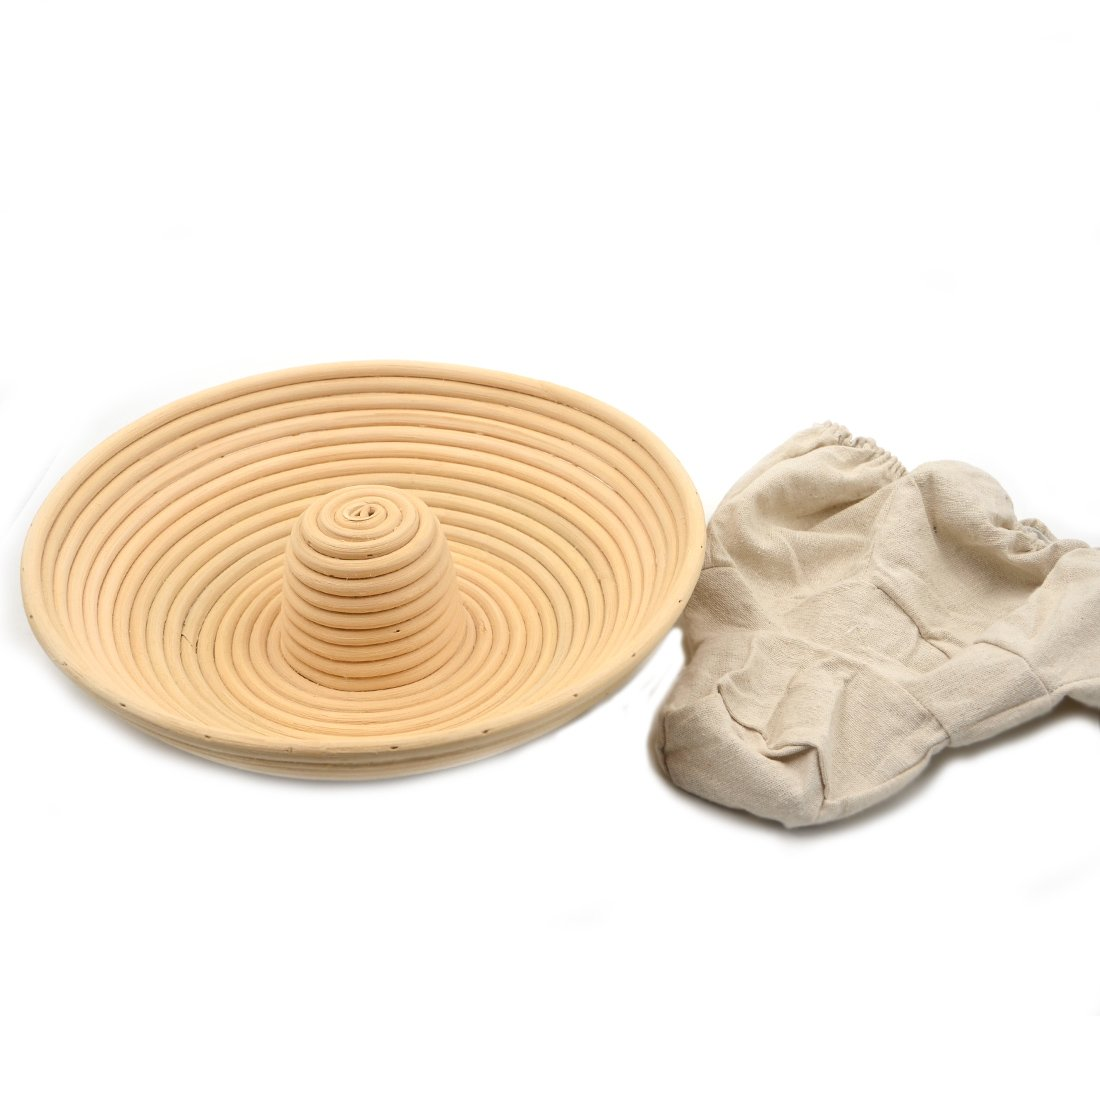 Round Banneton Brotform Bread Proofing Rattan Basket Handmade Cloth Liner AngelaKerry 1pcs 13x6cm 5 Diameter